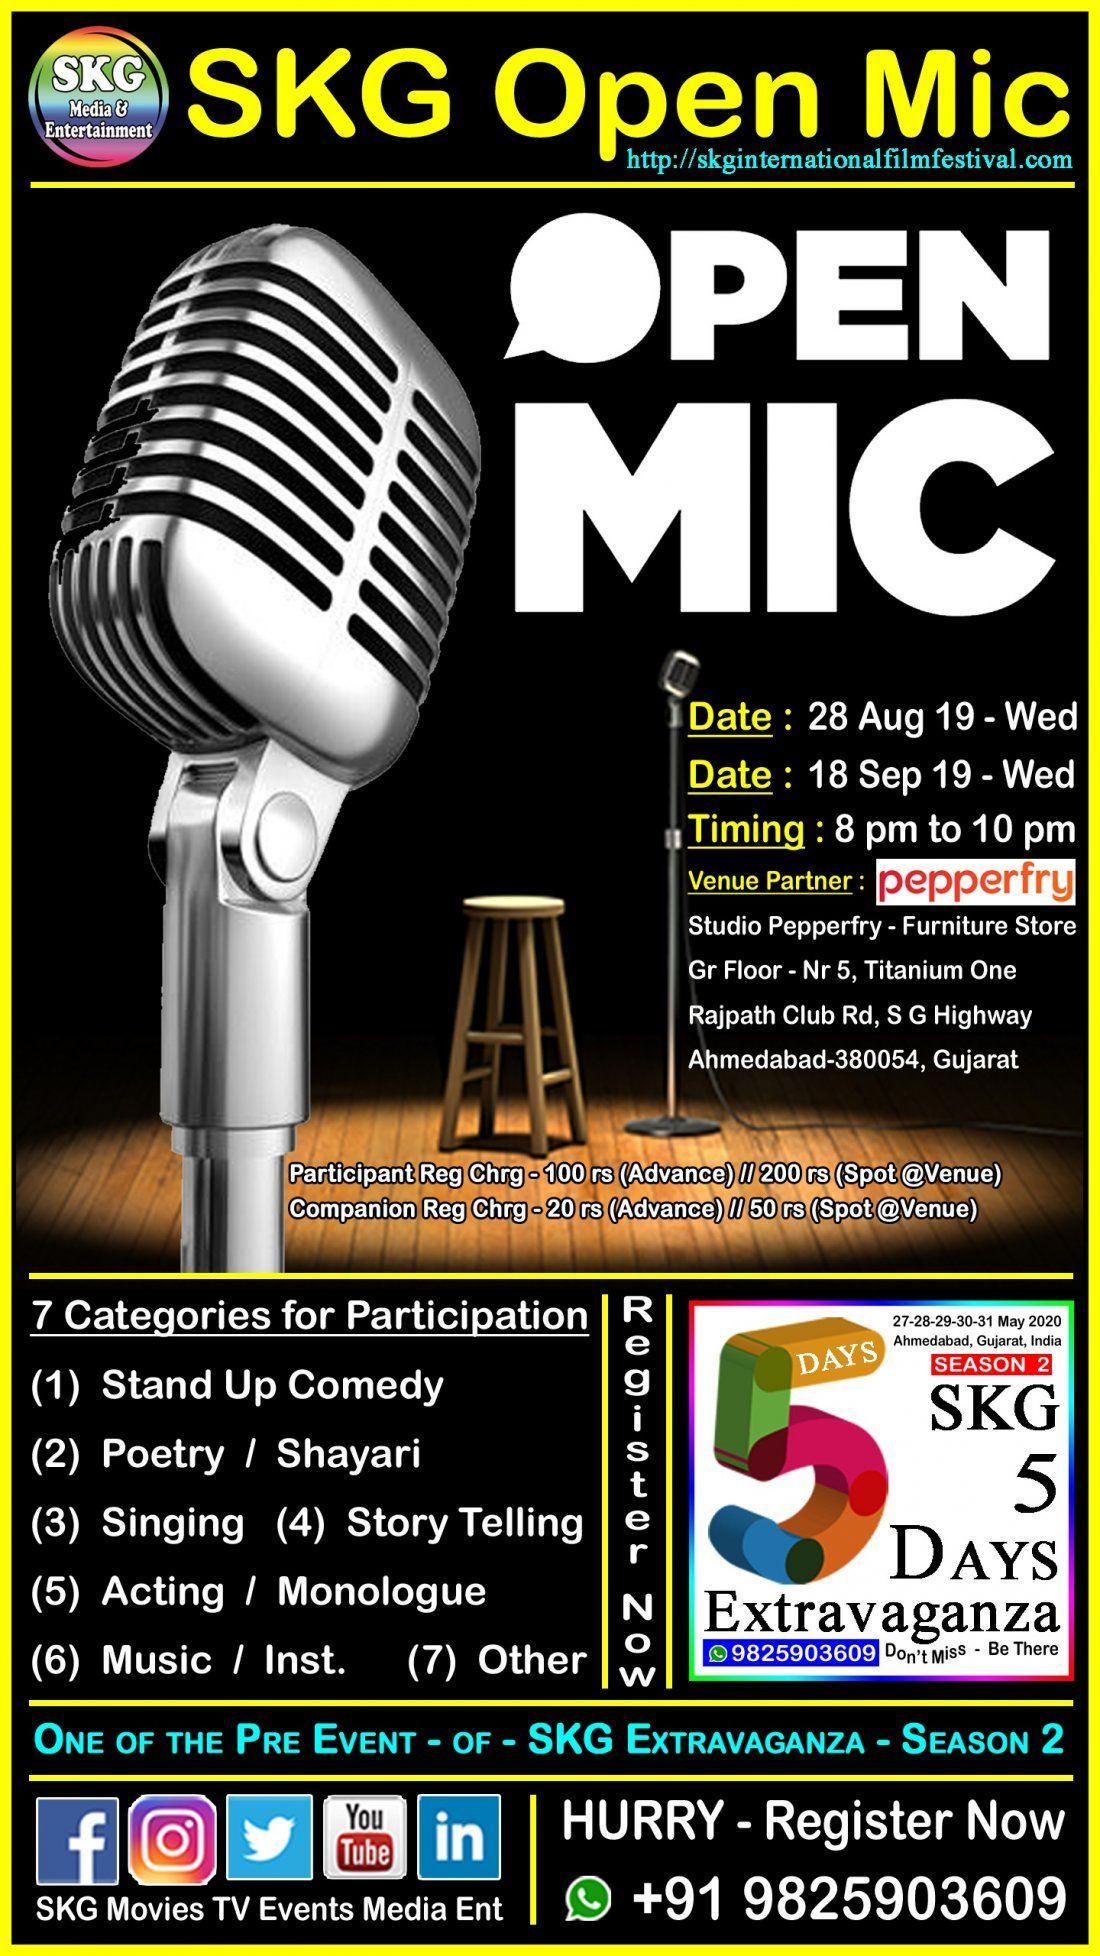 SKG Open Mic - 28 Aug 2019, Wednesday at Studio Pepperfry